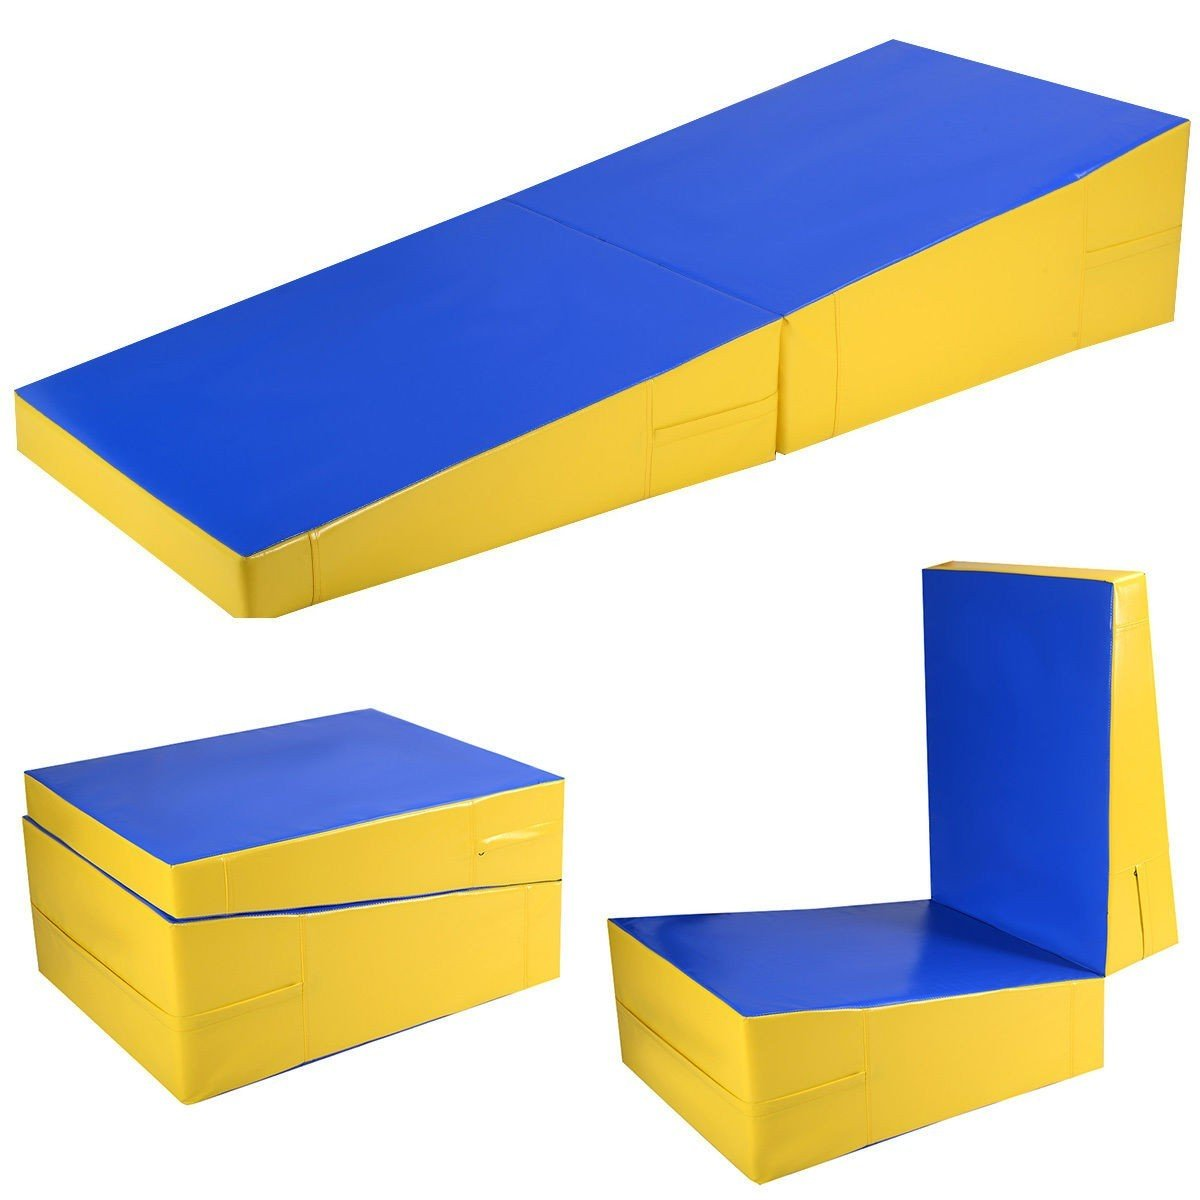 Folding Incline Wedge Ramp Gymnastics Mat by Apontus